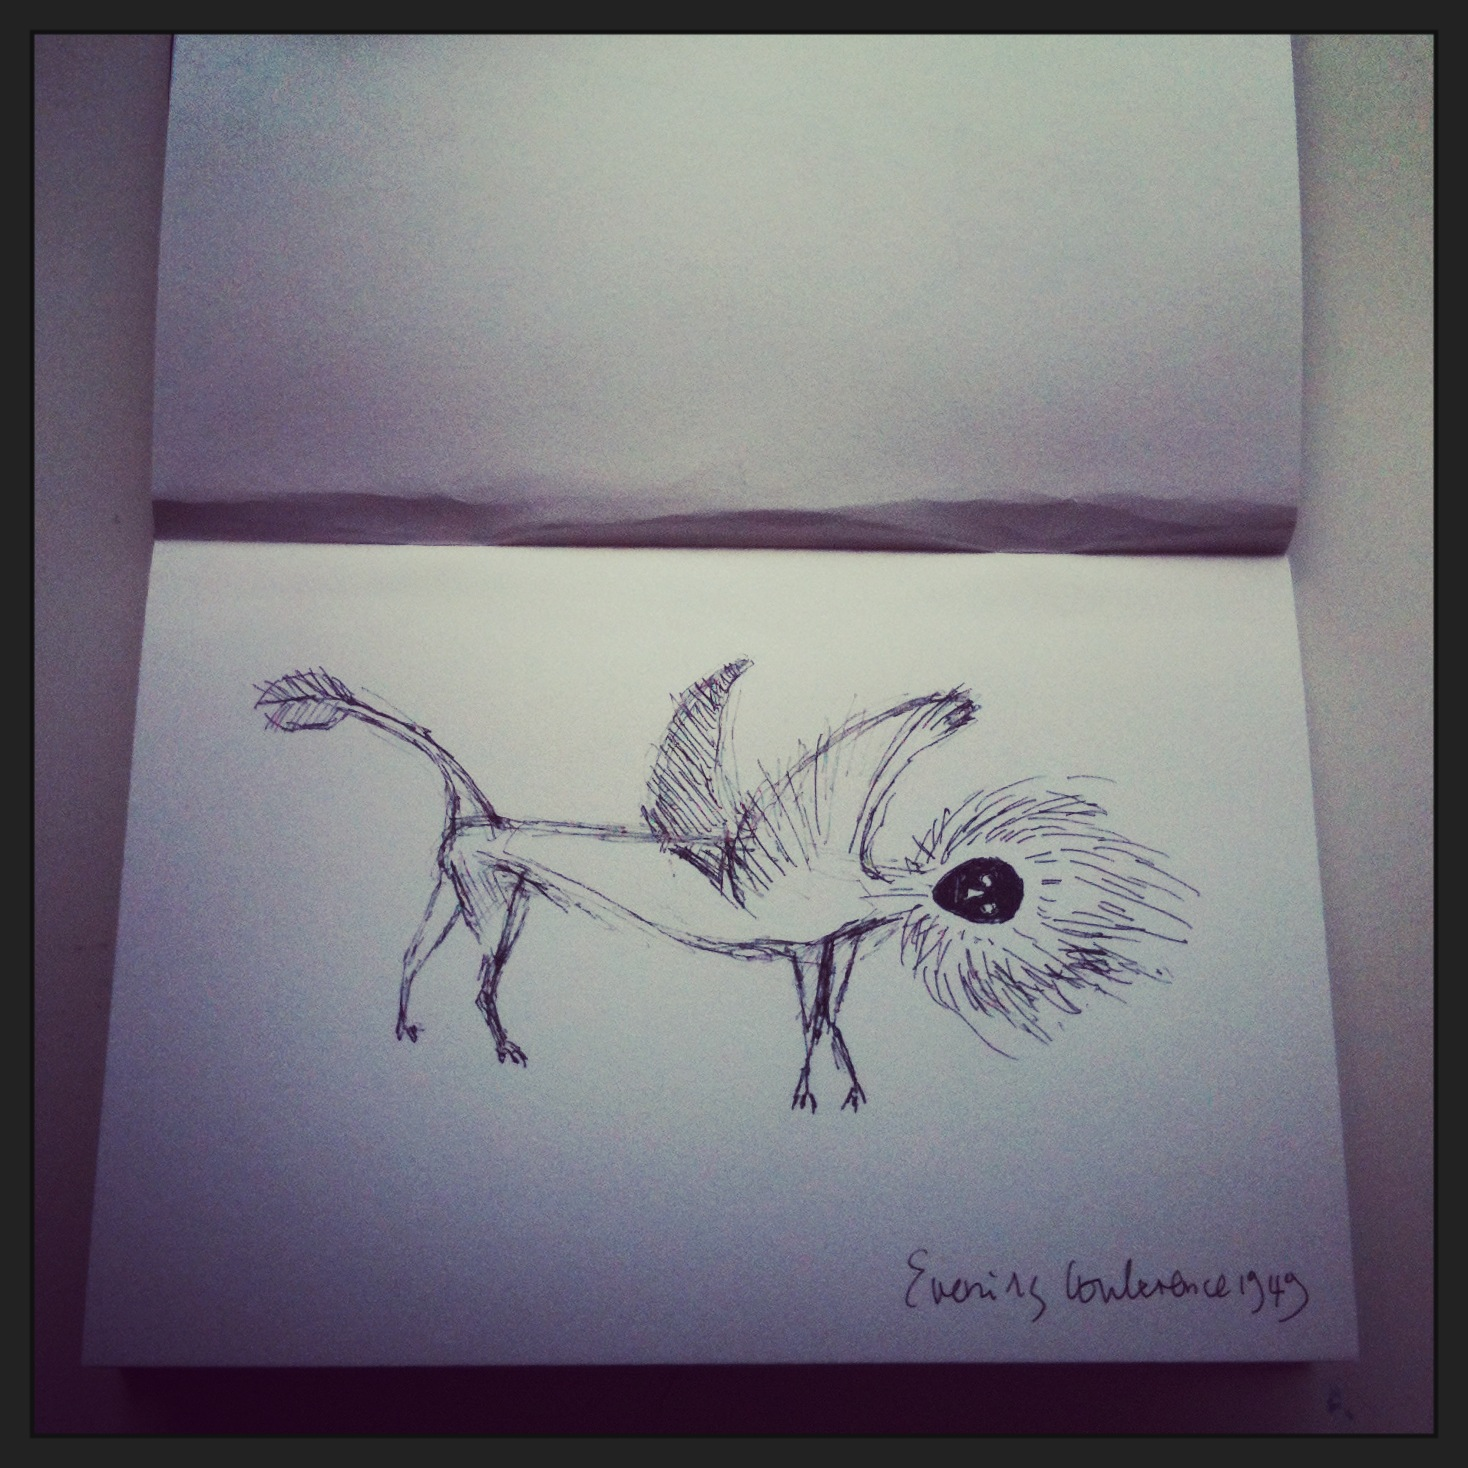 Sketch: Leonora Carrington, Tate Liverpool, 2015